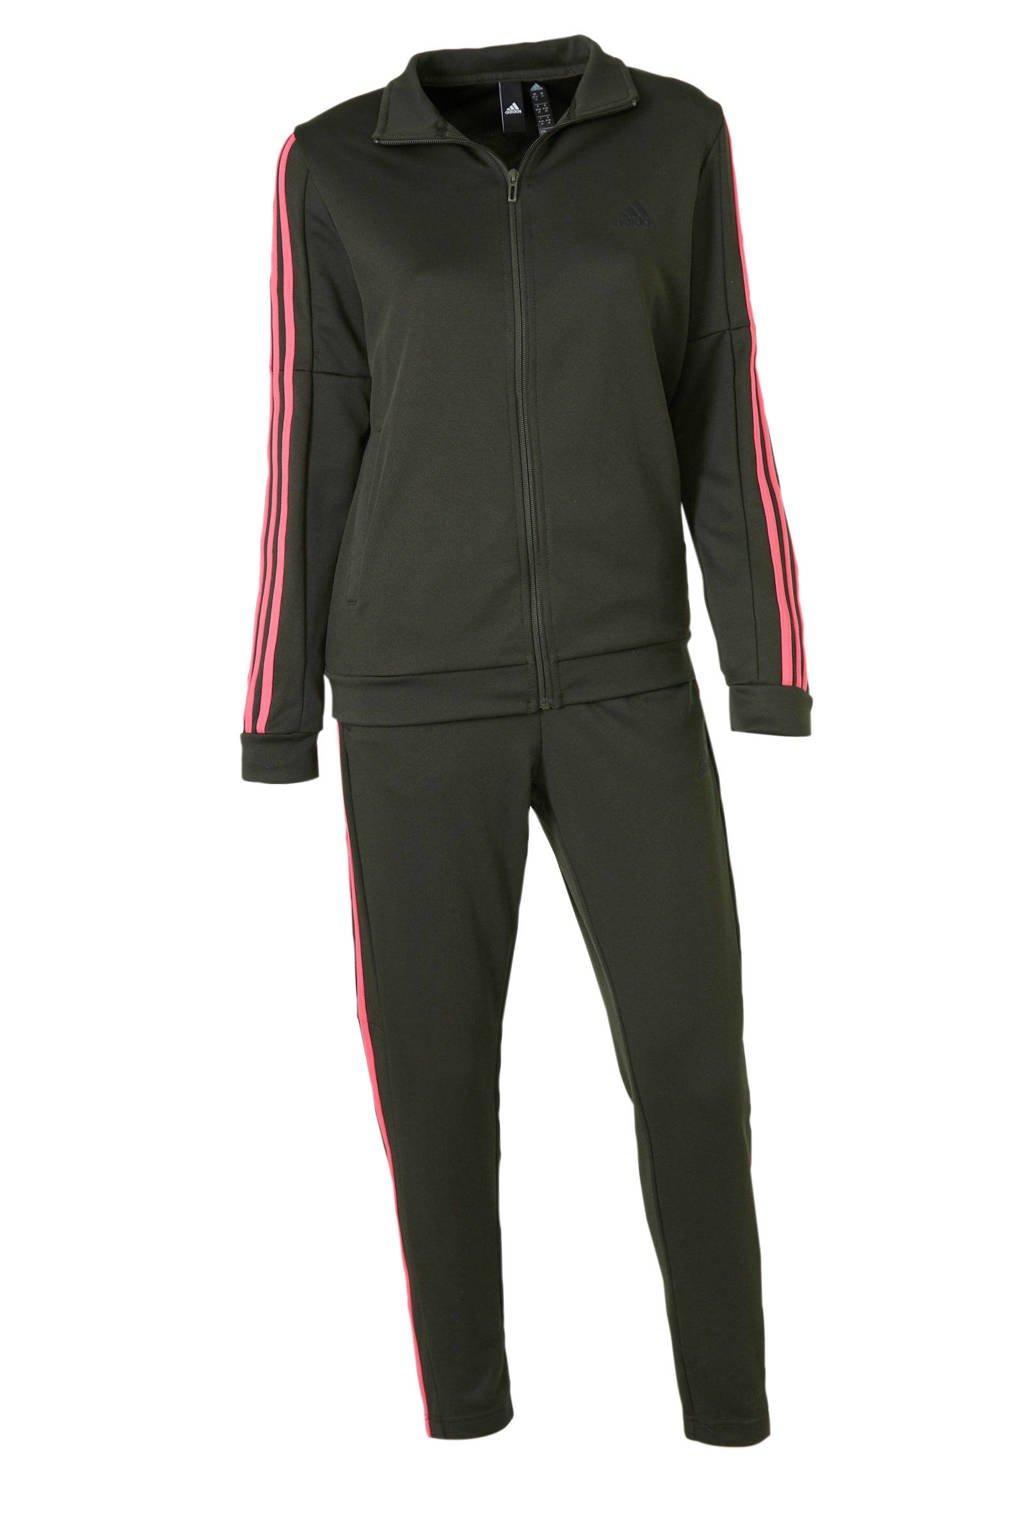 adidas performance trainingspak grijsgroen/roze, Grijsgroen/roze